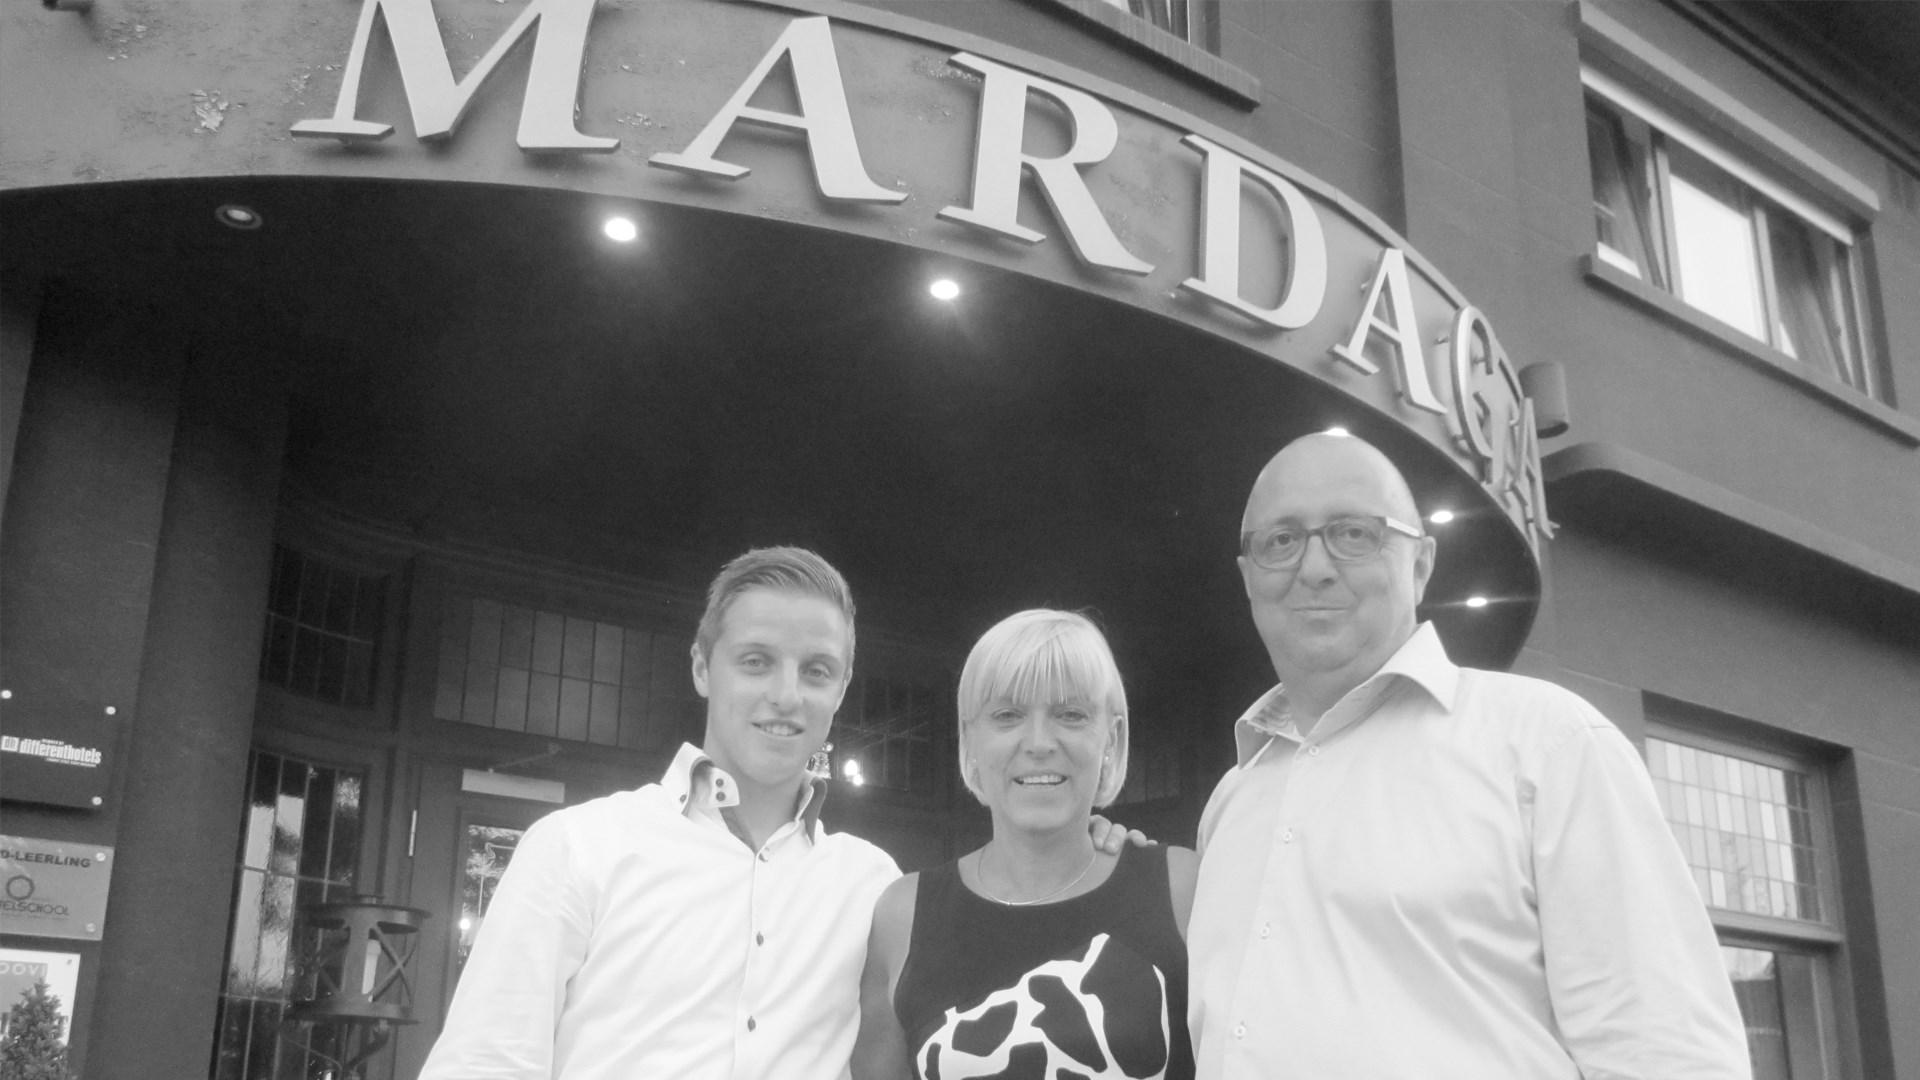 HOTEL MARDAGA FAMILIE